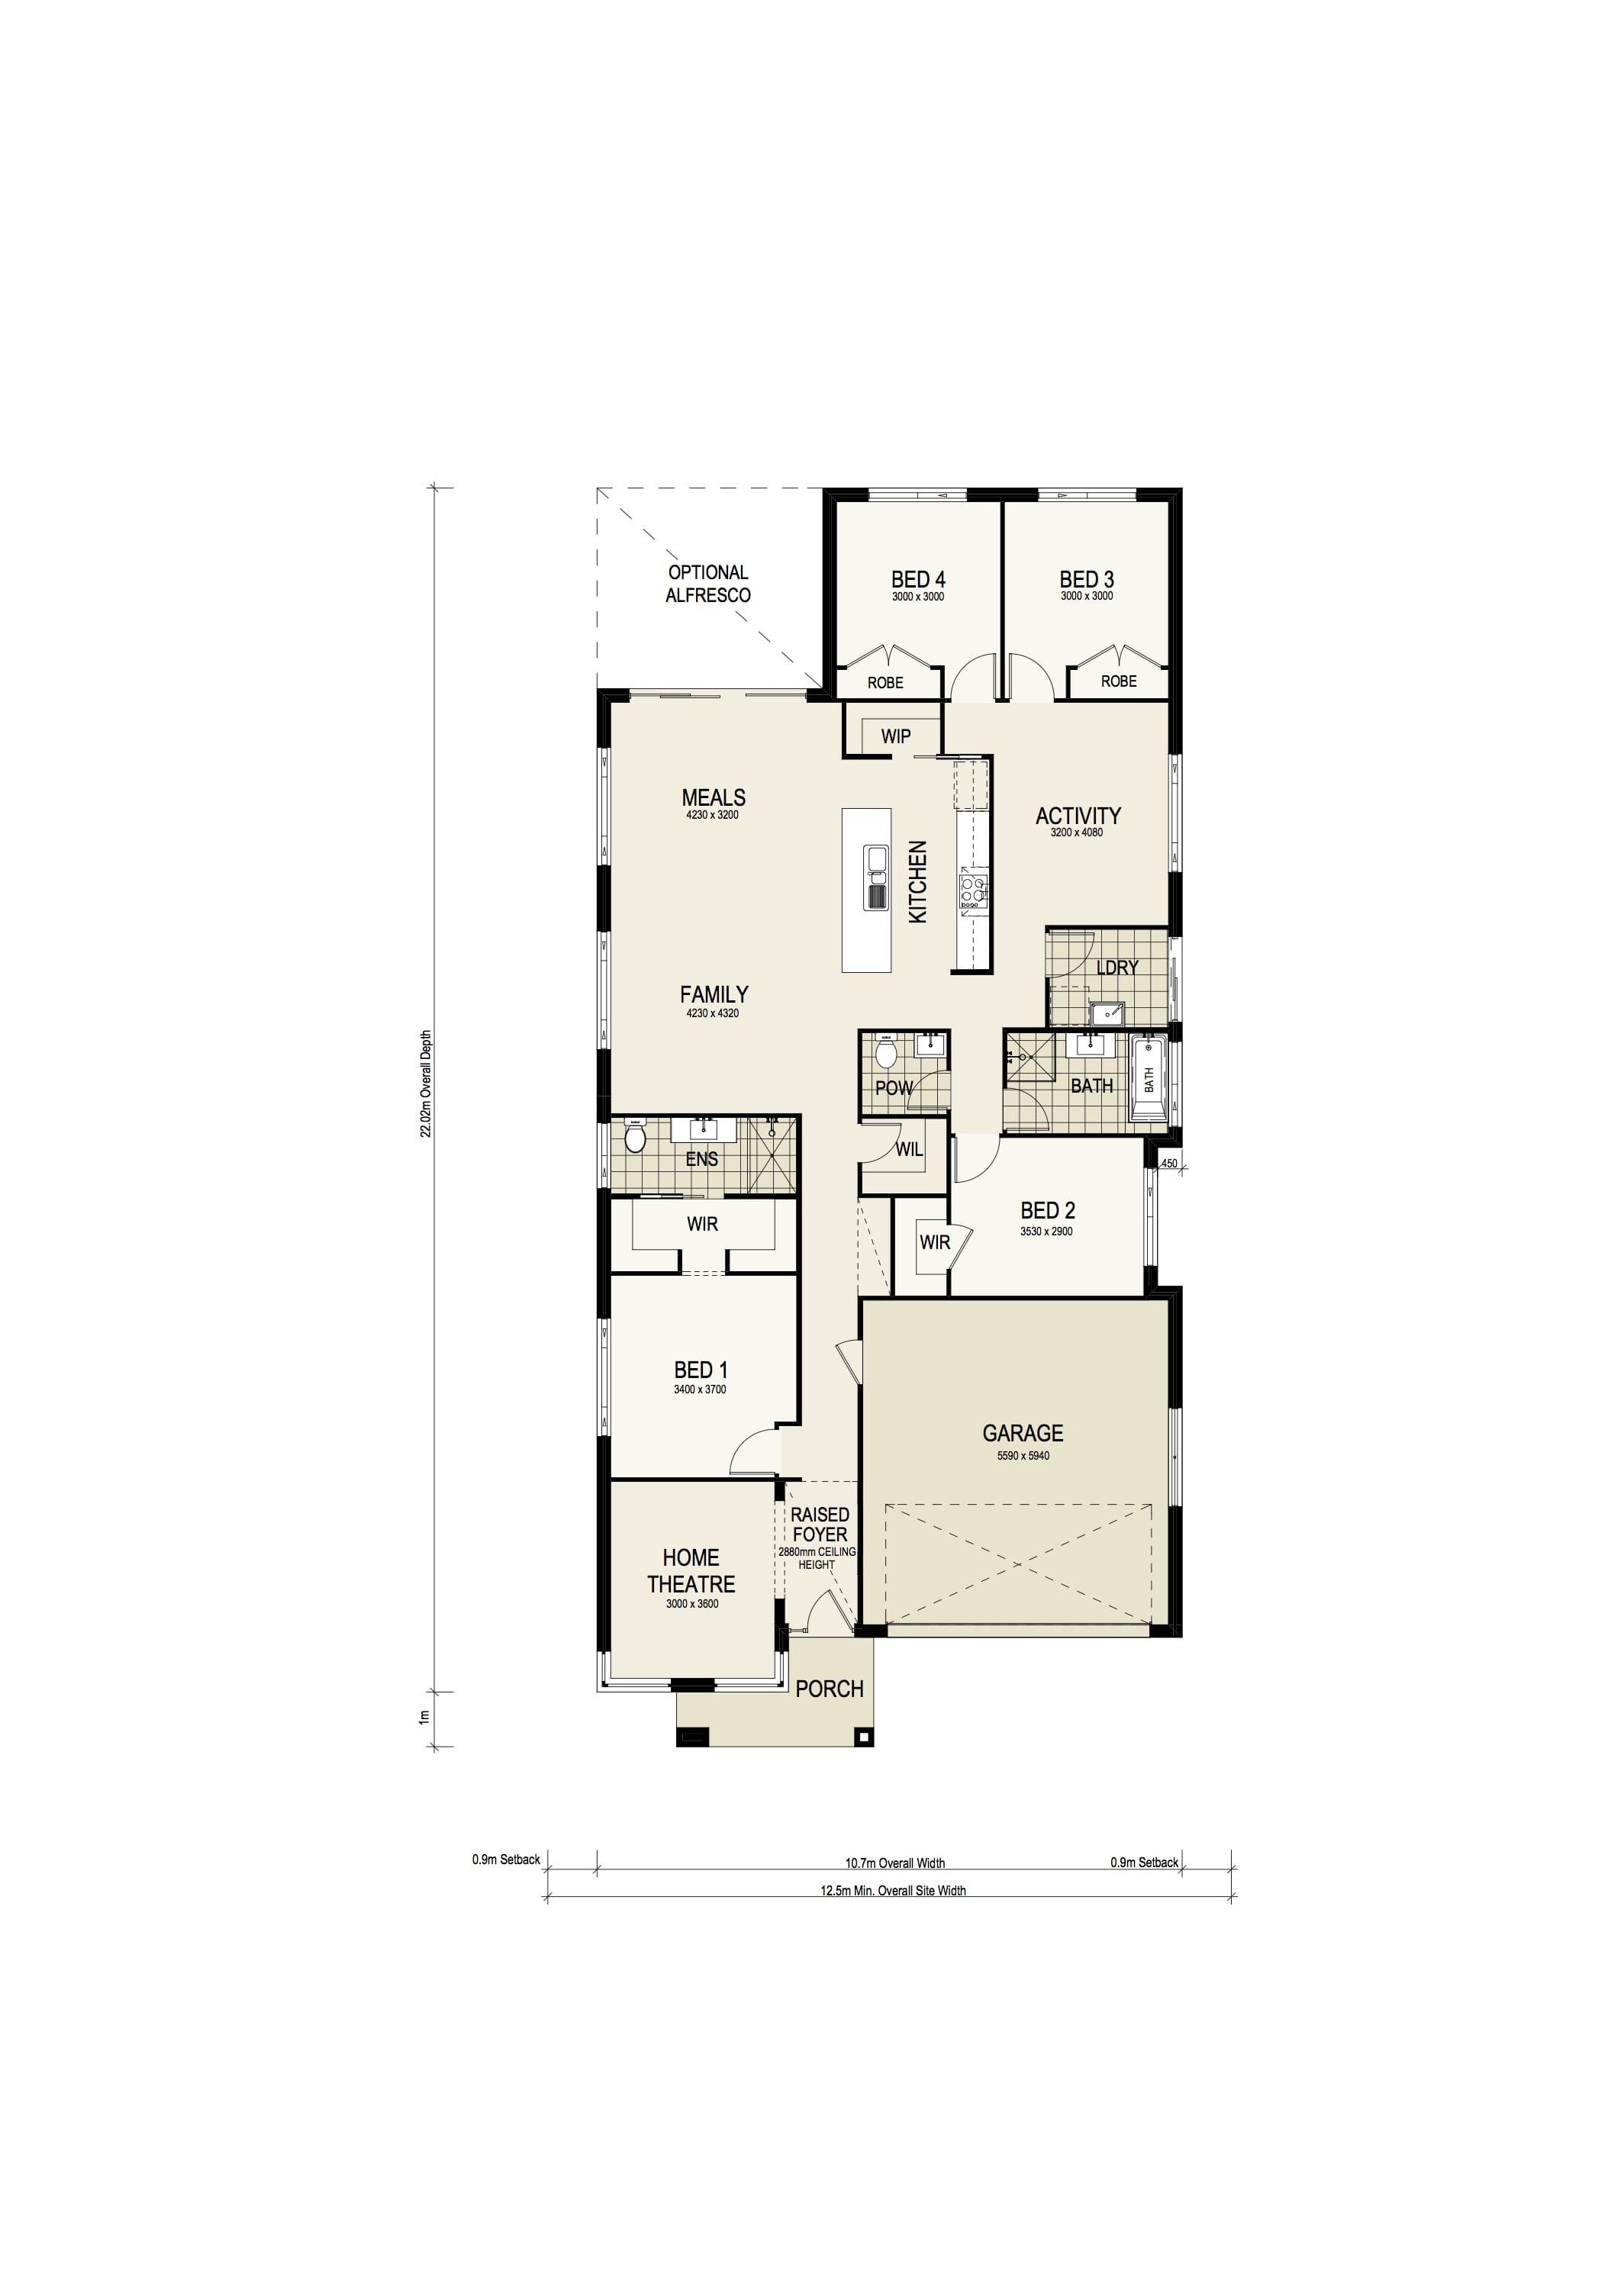 Montgomery Homes Southport 217 Retro Warnervale Floorplan